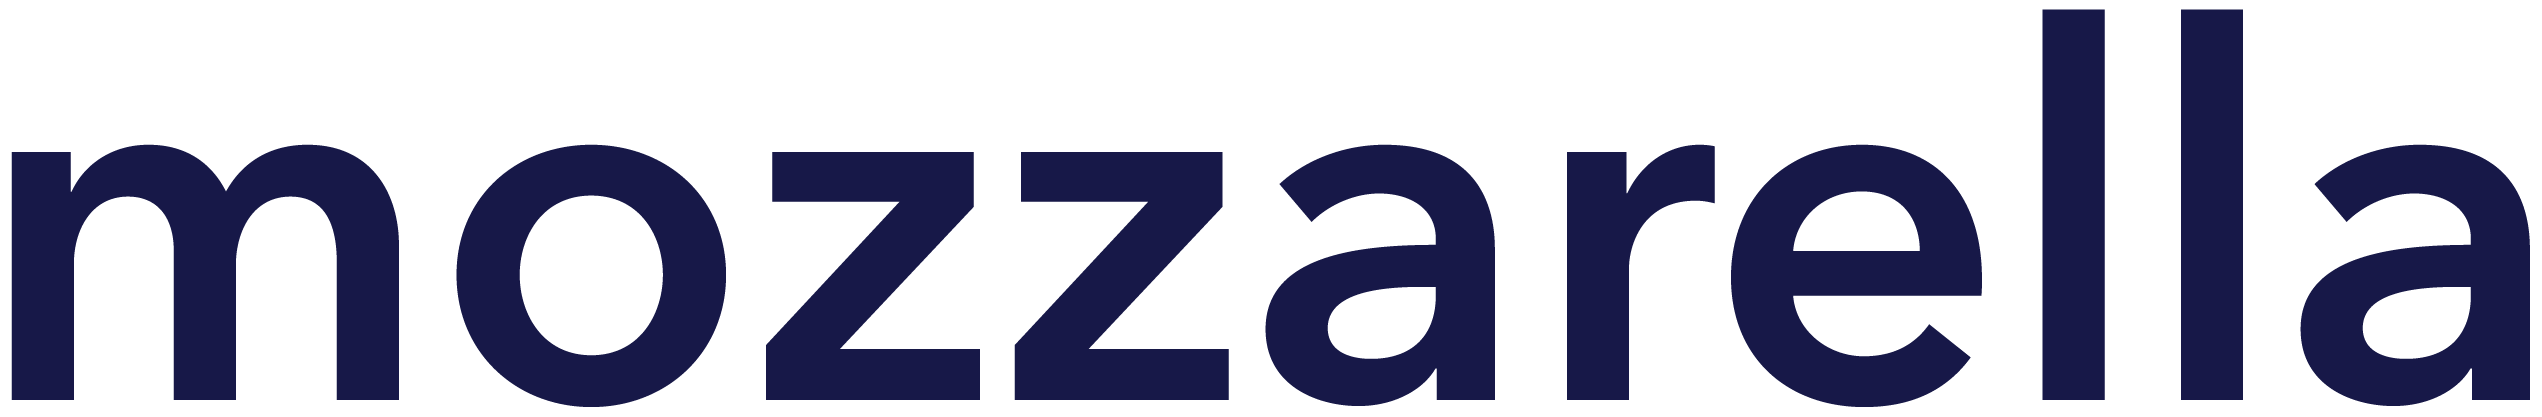 Mozzarella Studio